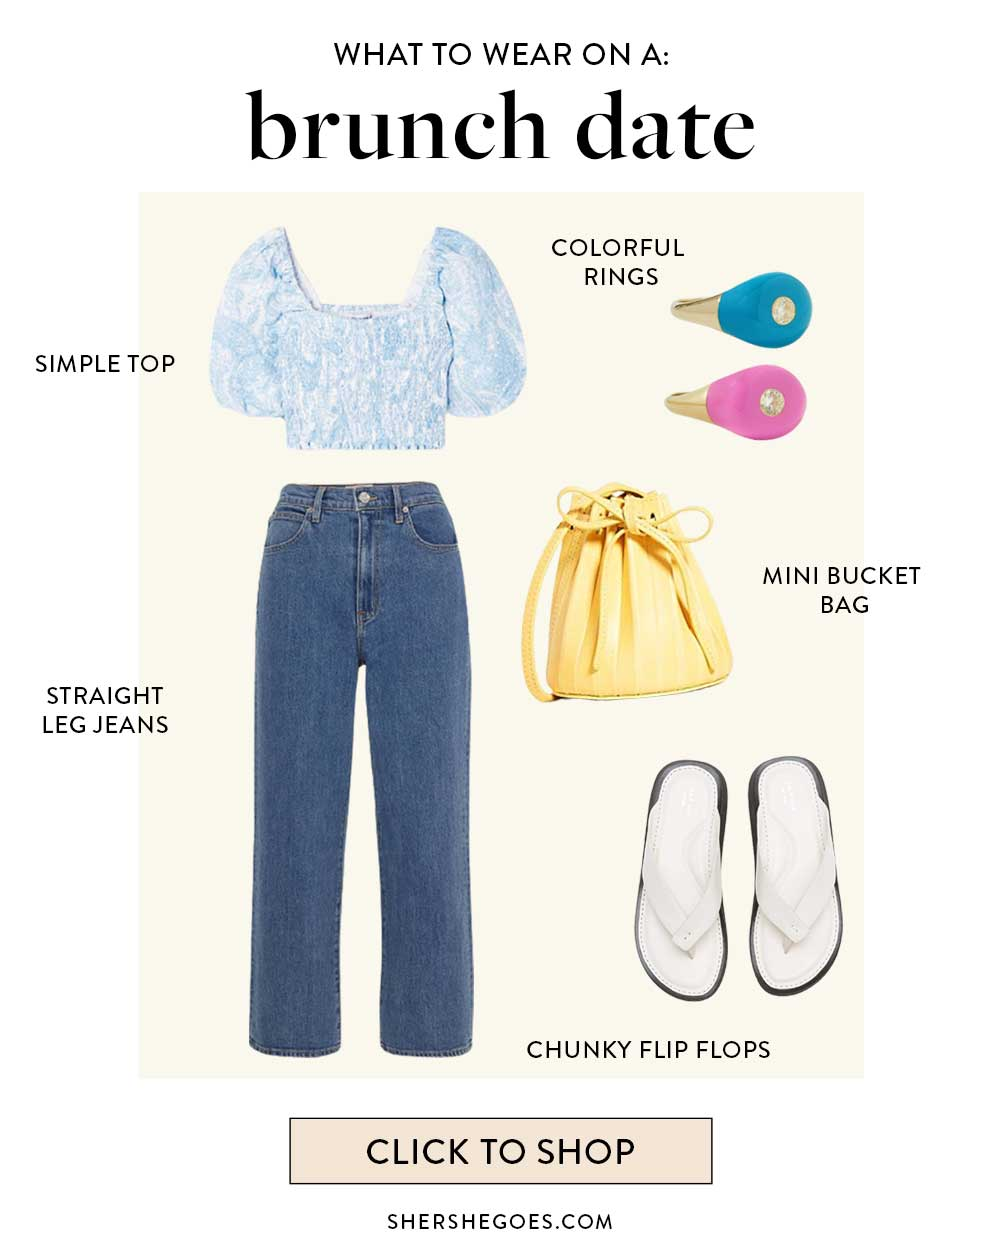 brunch-date-outfit-ideas